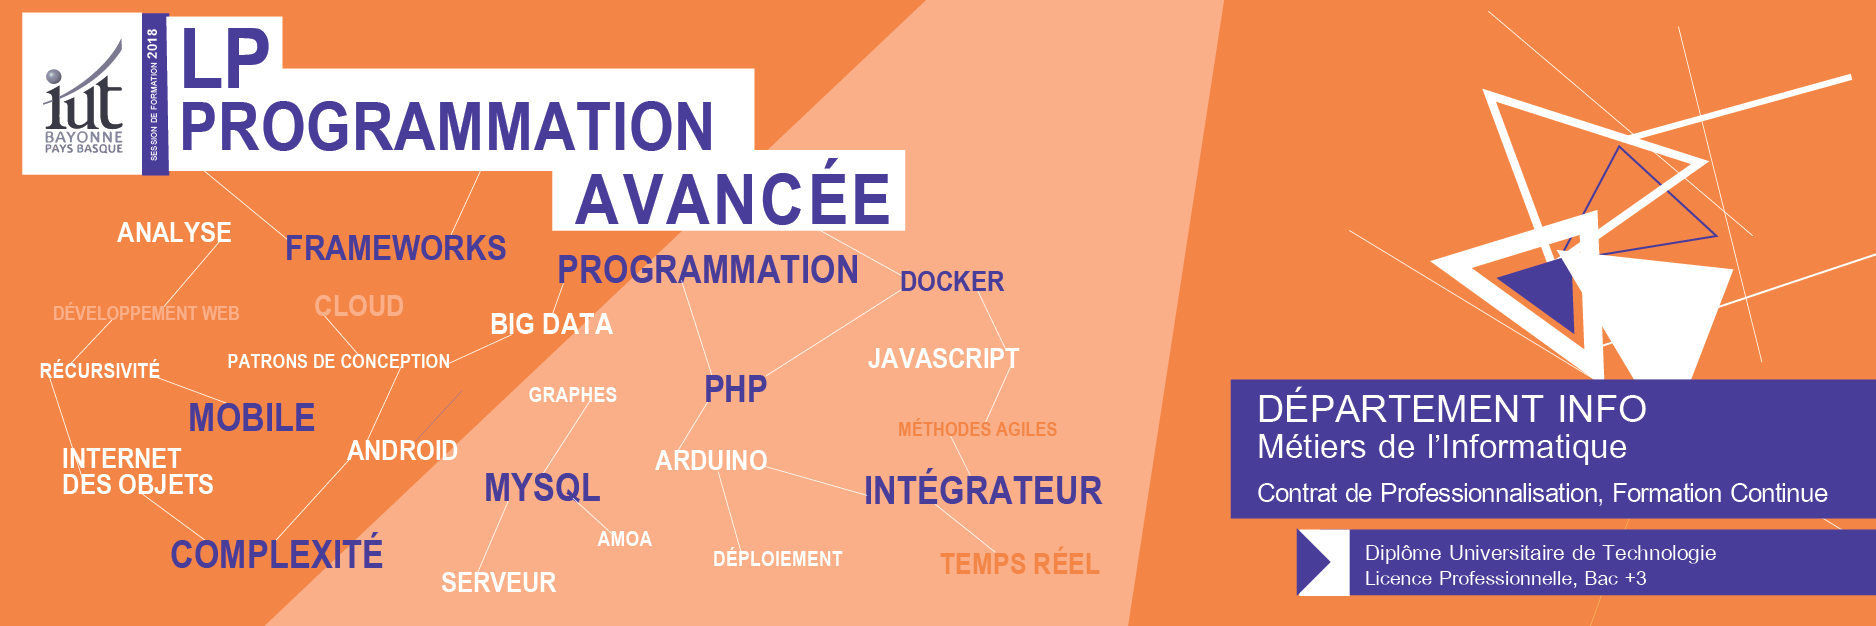 info-lp_programmation_avancee-iut_bayonne-iut_bayonne-paysbasque